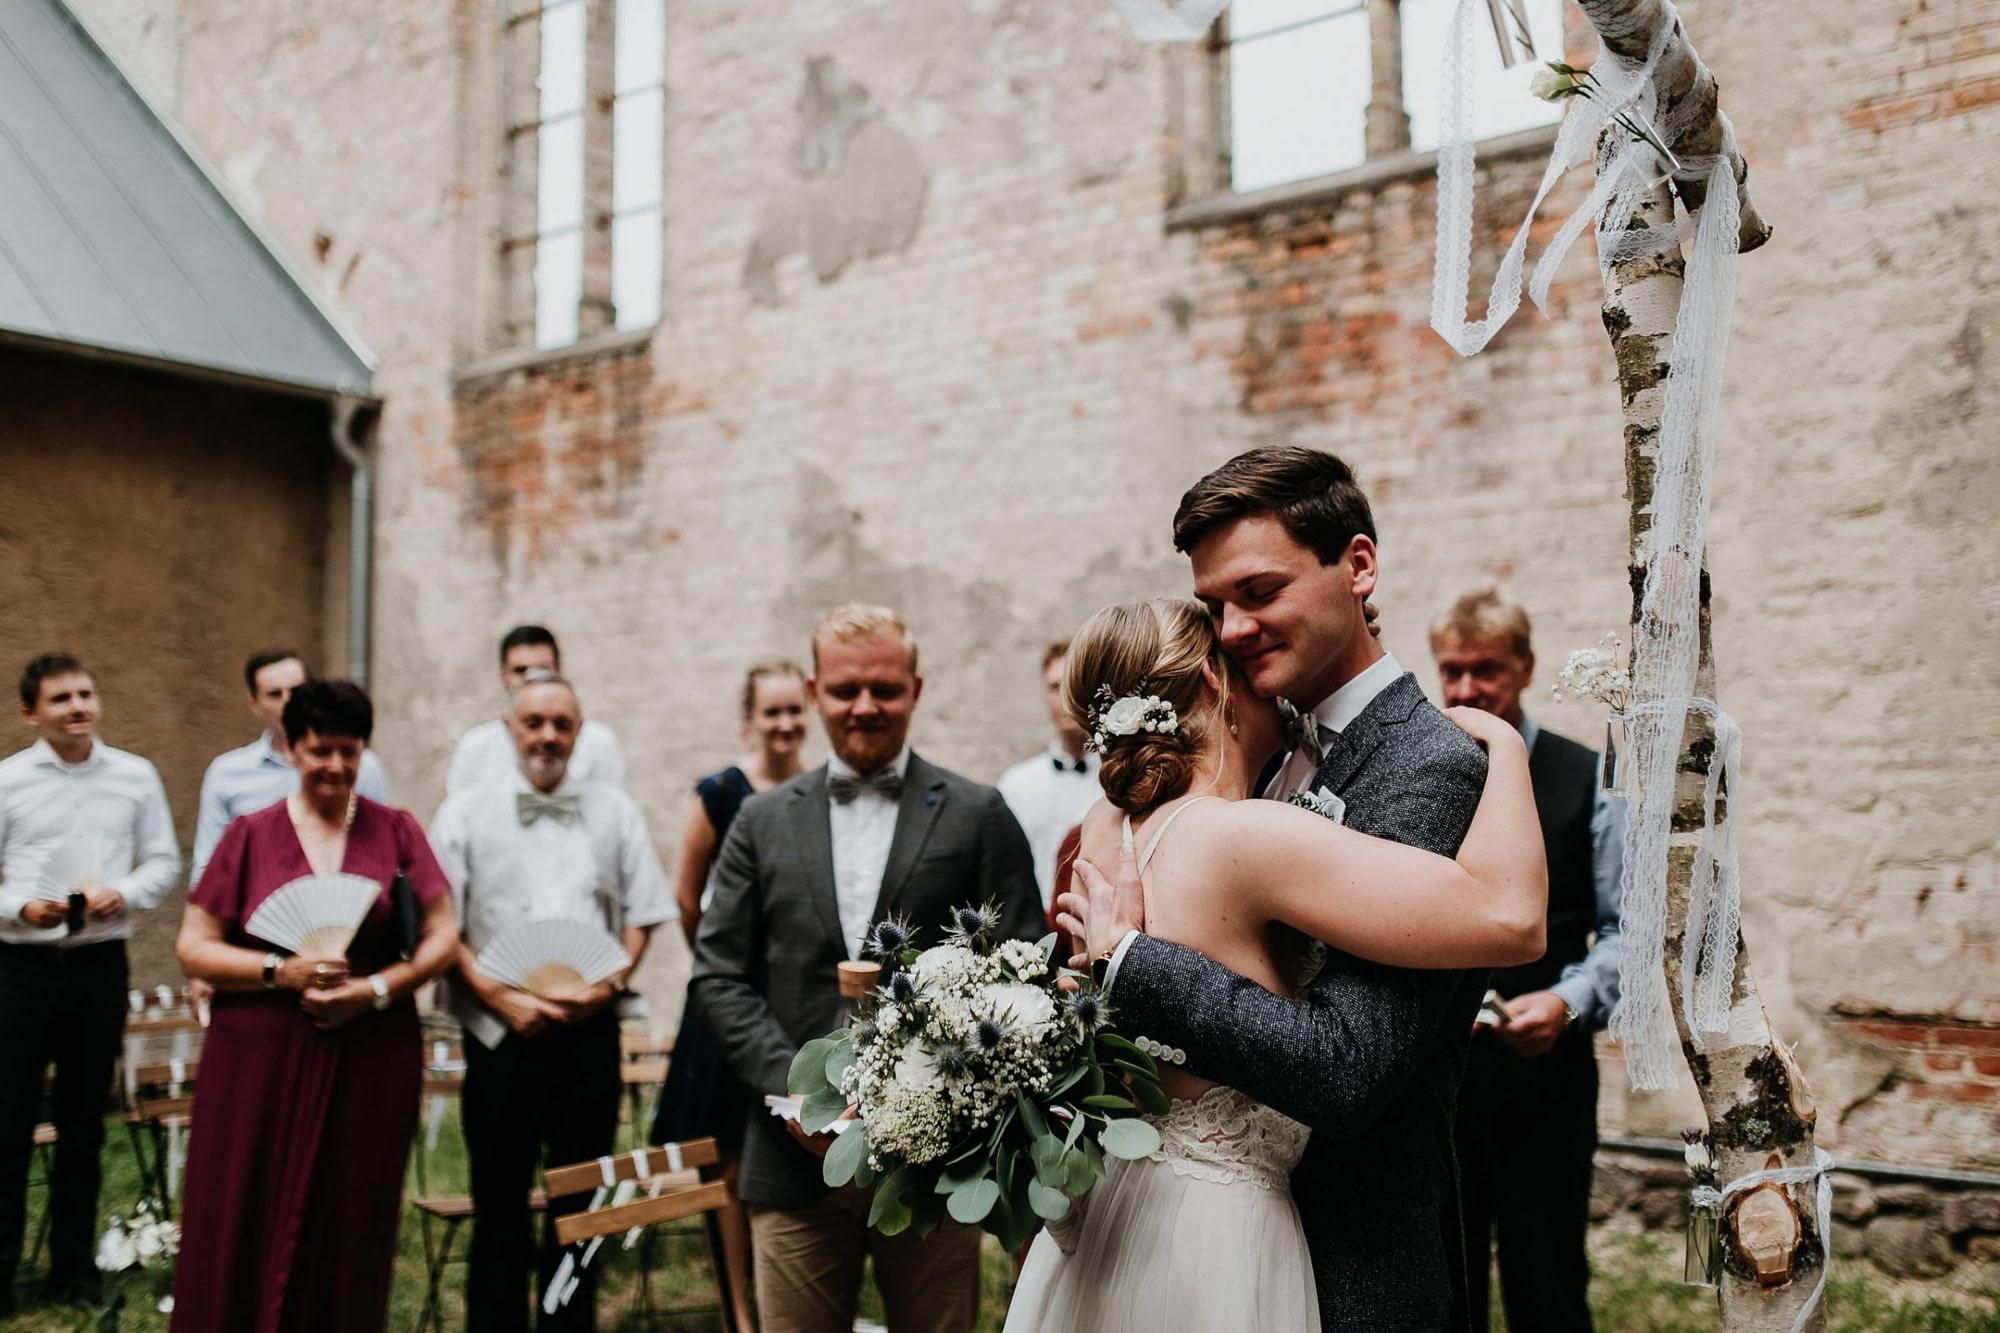 boho wedding, hochzeit berlin, braut, groom, bride, bräutigam, trauung, freie trauung, ceremony